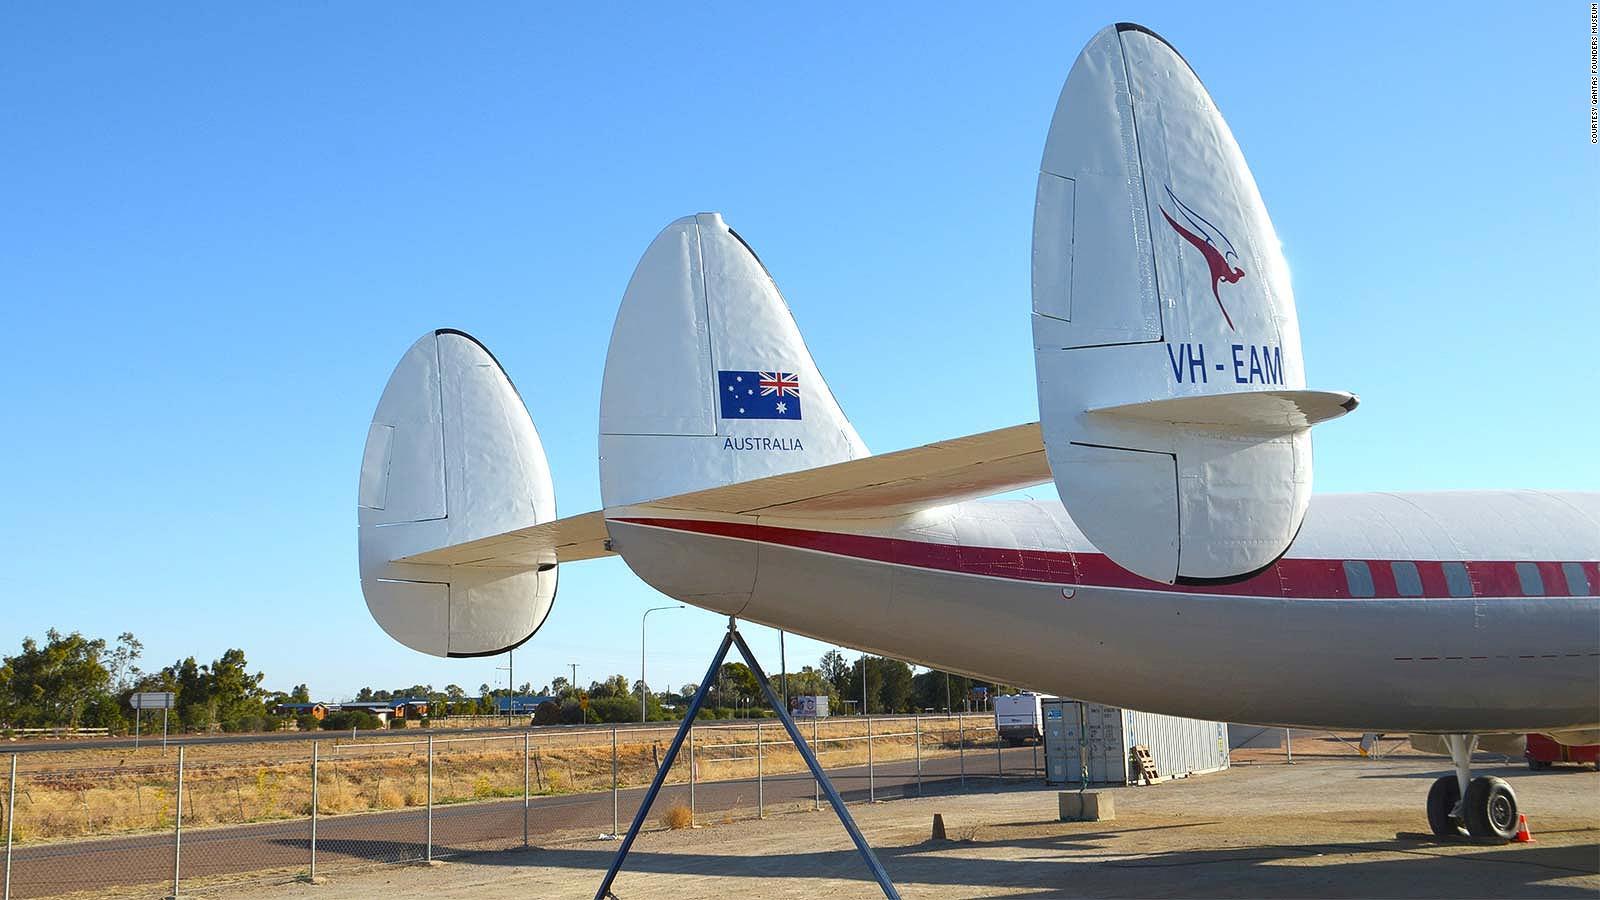 Qantas Super Constellation airliner from 1950s is restored | CNN Travel